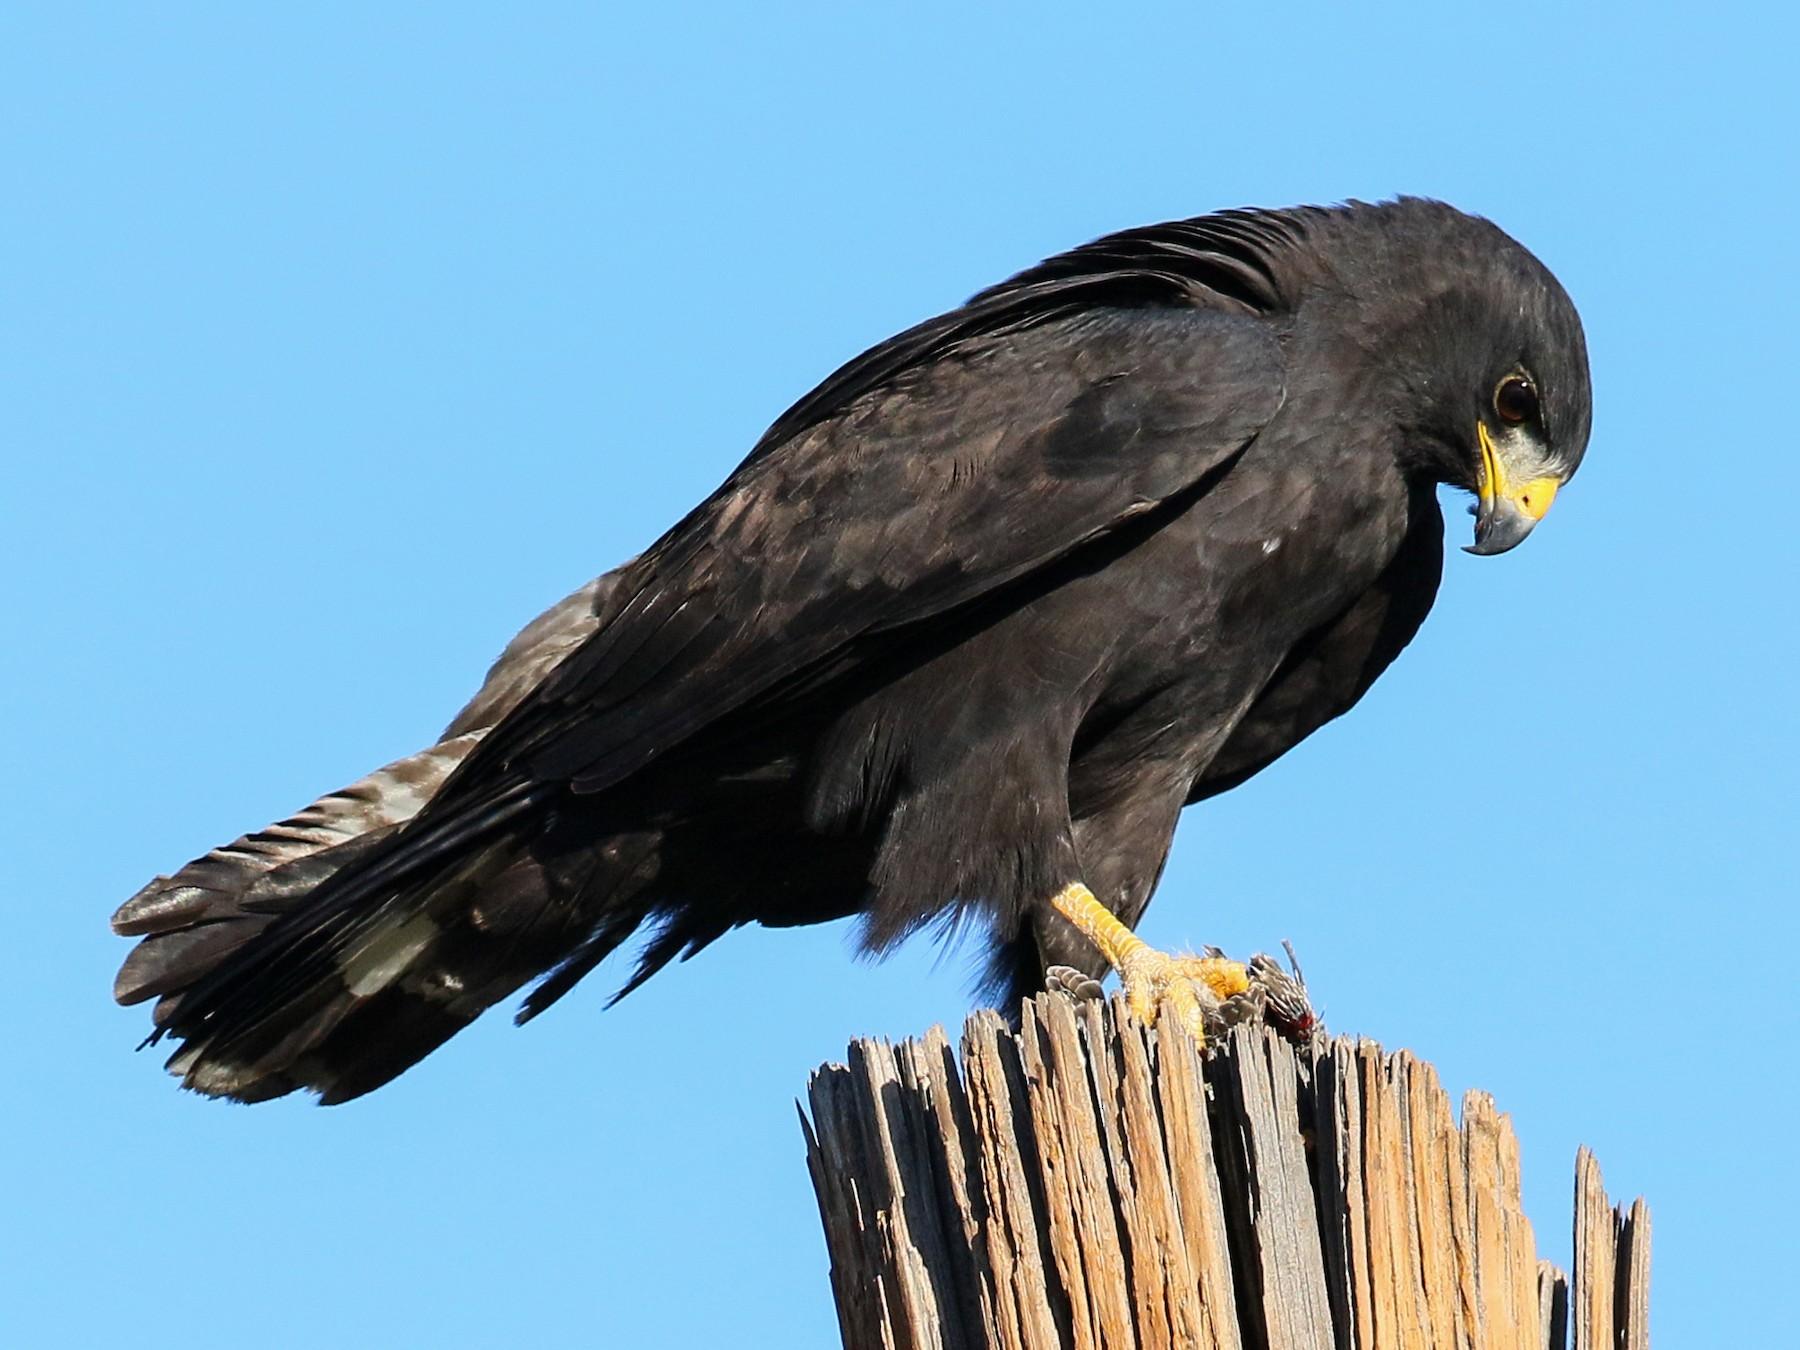 Zone-tailed Hawk - Chris McCreedy - no playbacks